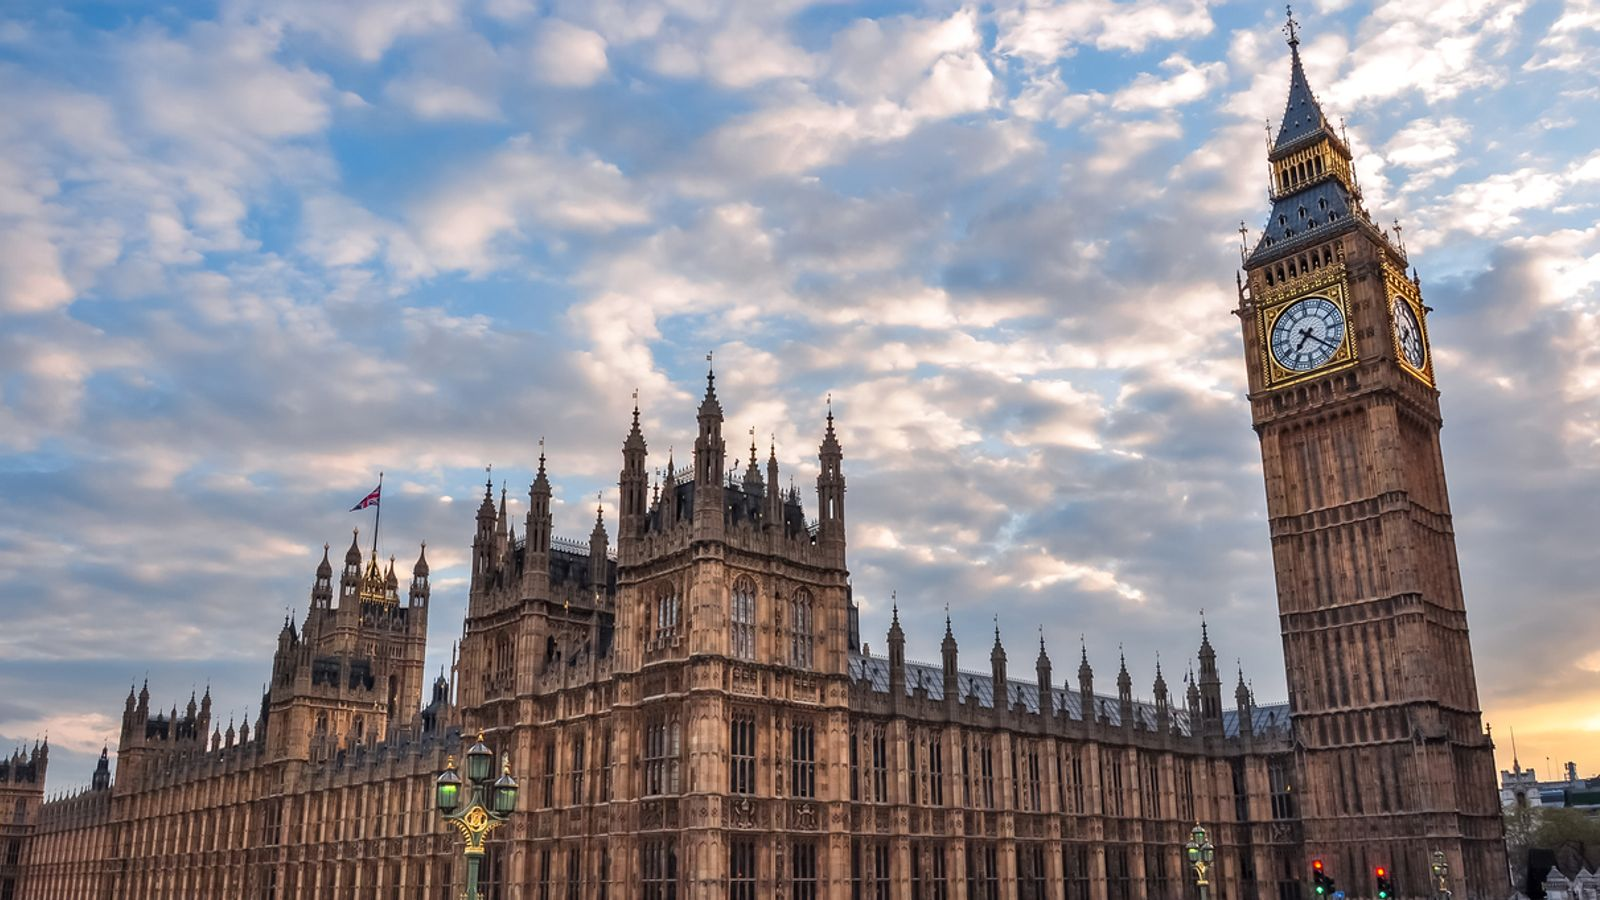 Conservative MP not suspended after arrest on suspicion of rape